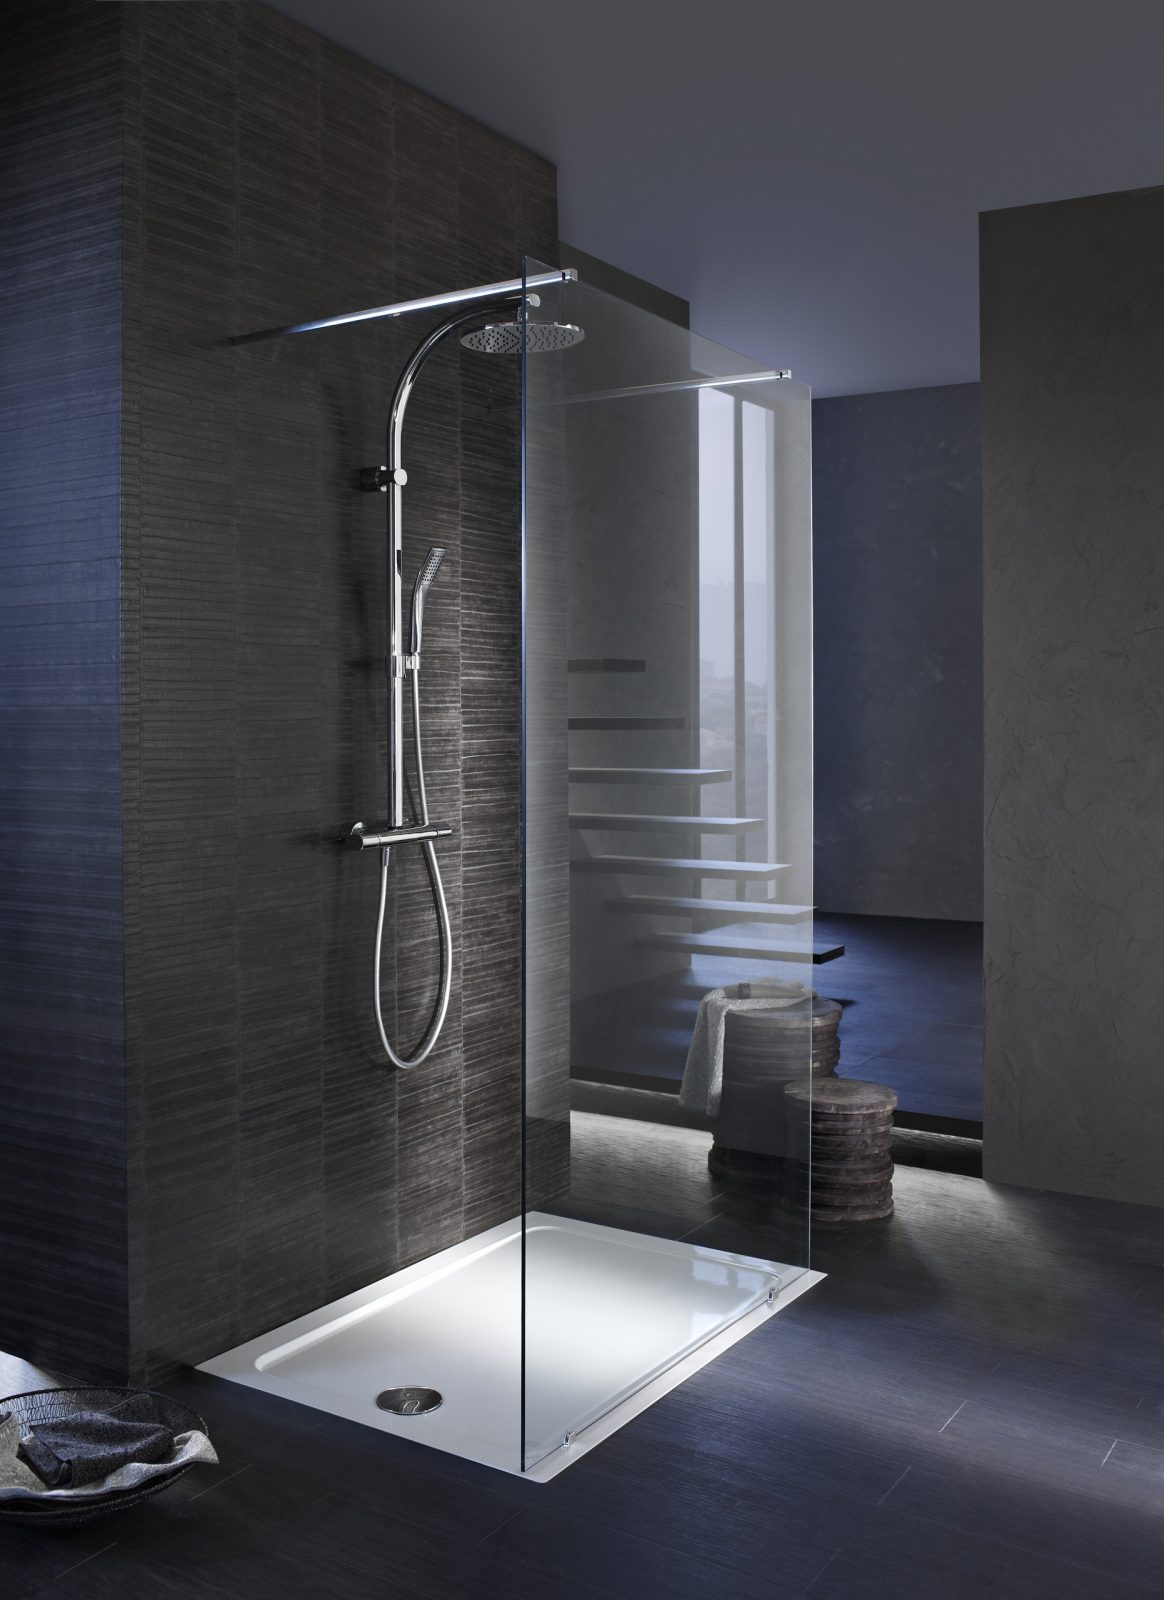 grand receveur de douche cheap receveurs de douche bass with grand receveur de douche grand. Black Bedroom Furniture Sets. Home Design Ideas